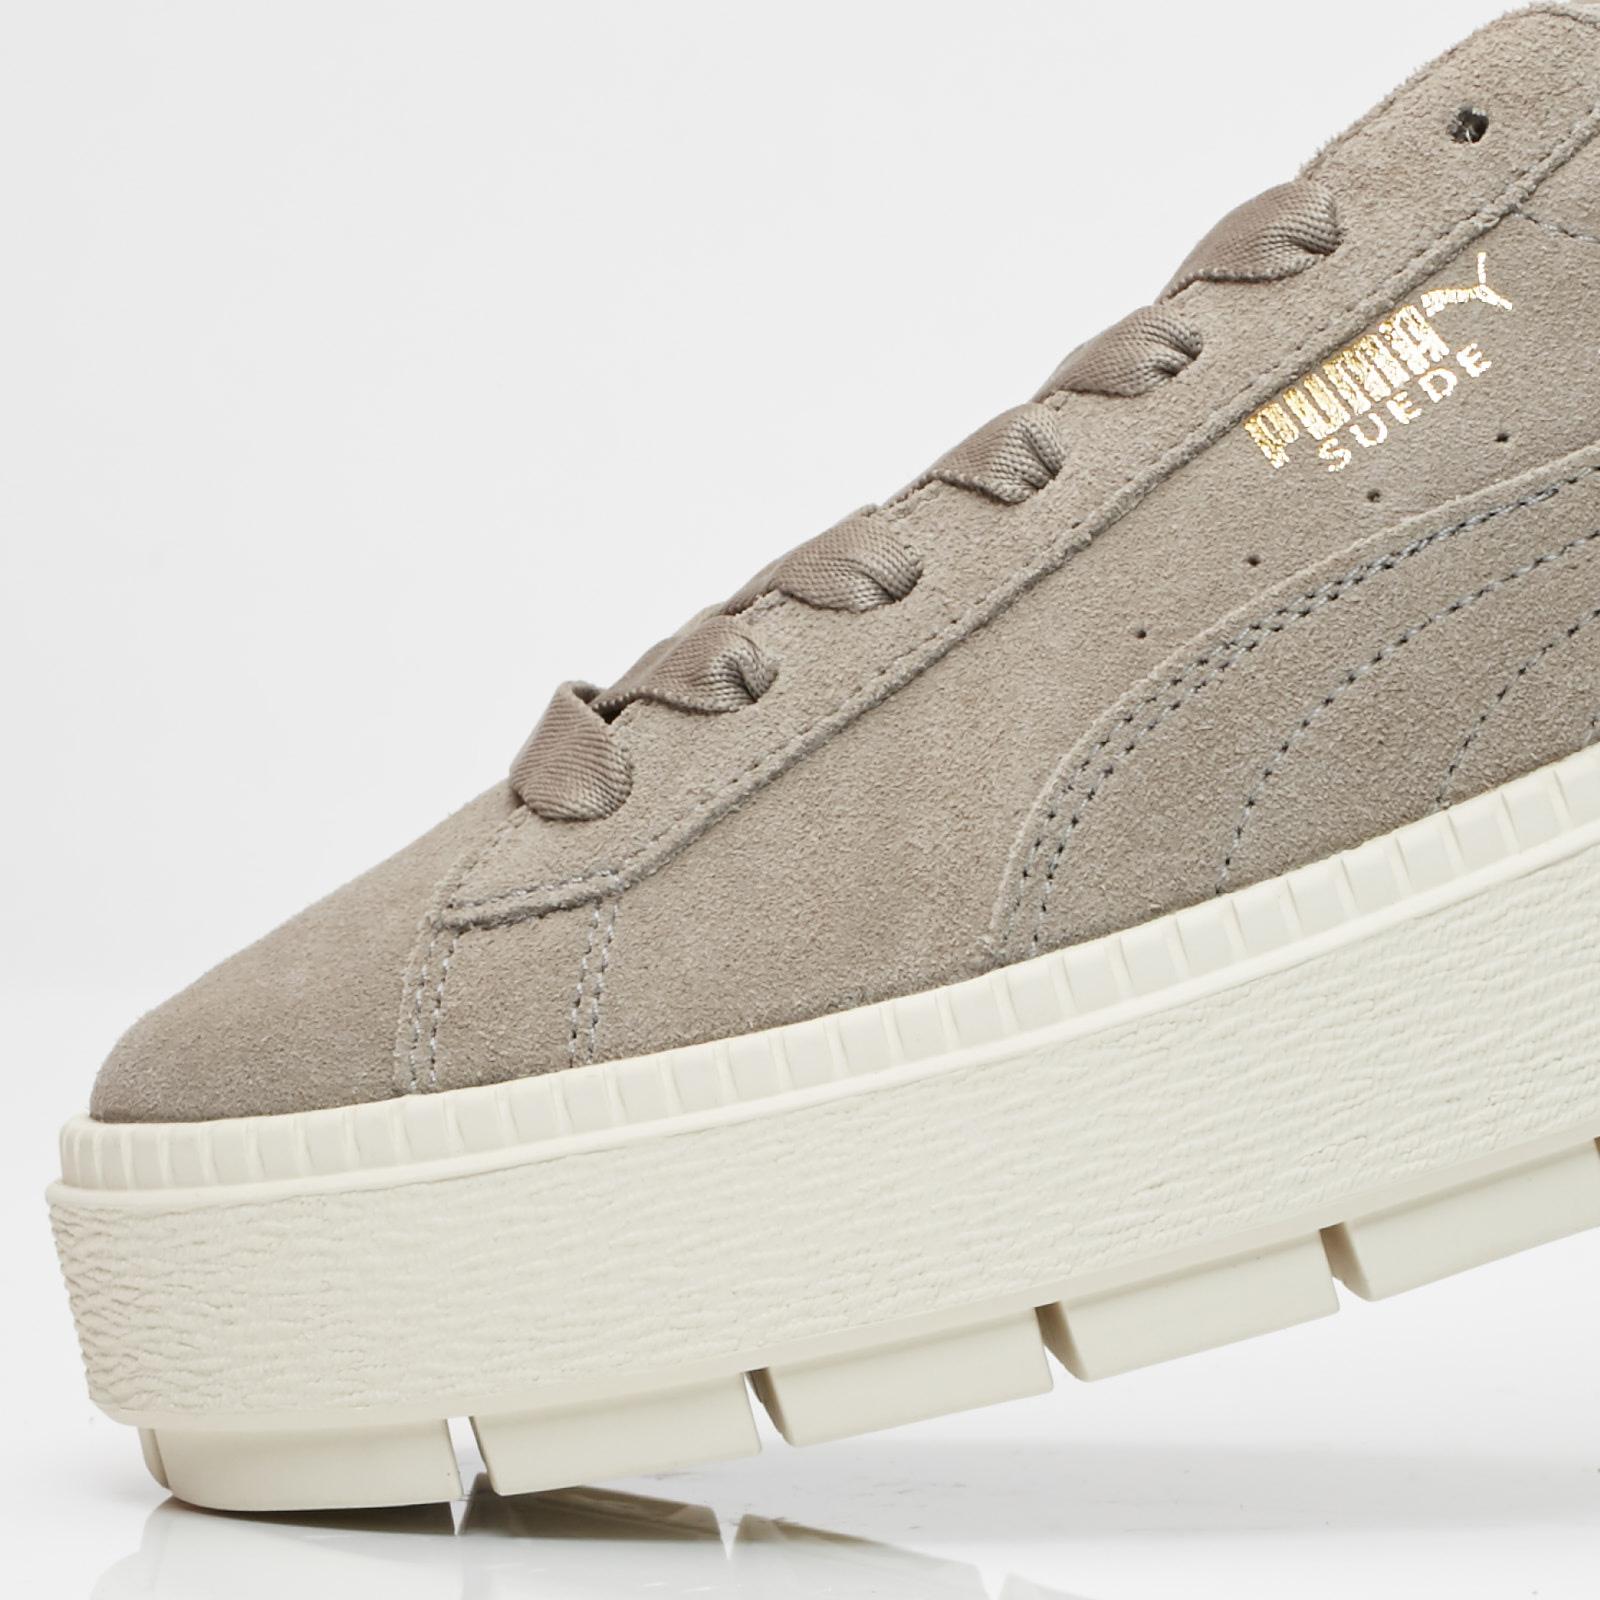 5f6a5c70273 Puma Suede Platform Trace WNs - 365830-06 - Sneakersnstuff ...